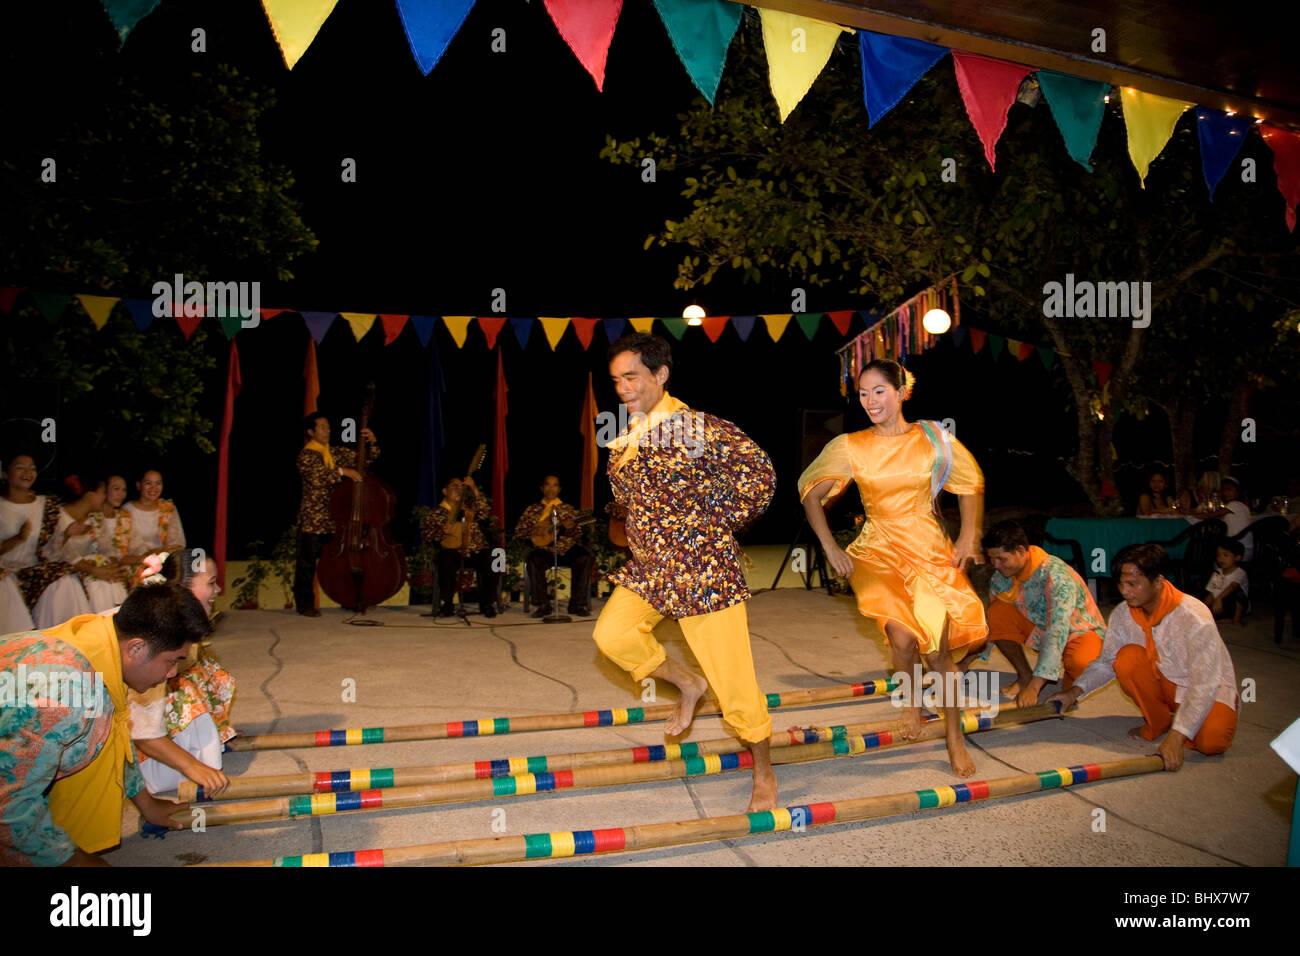 tinikling dance origin